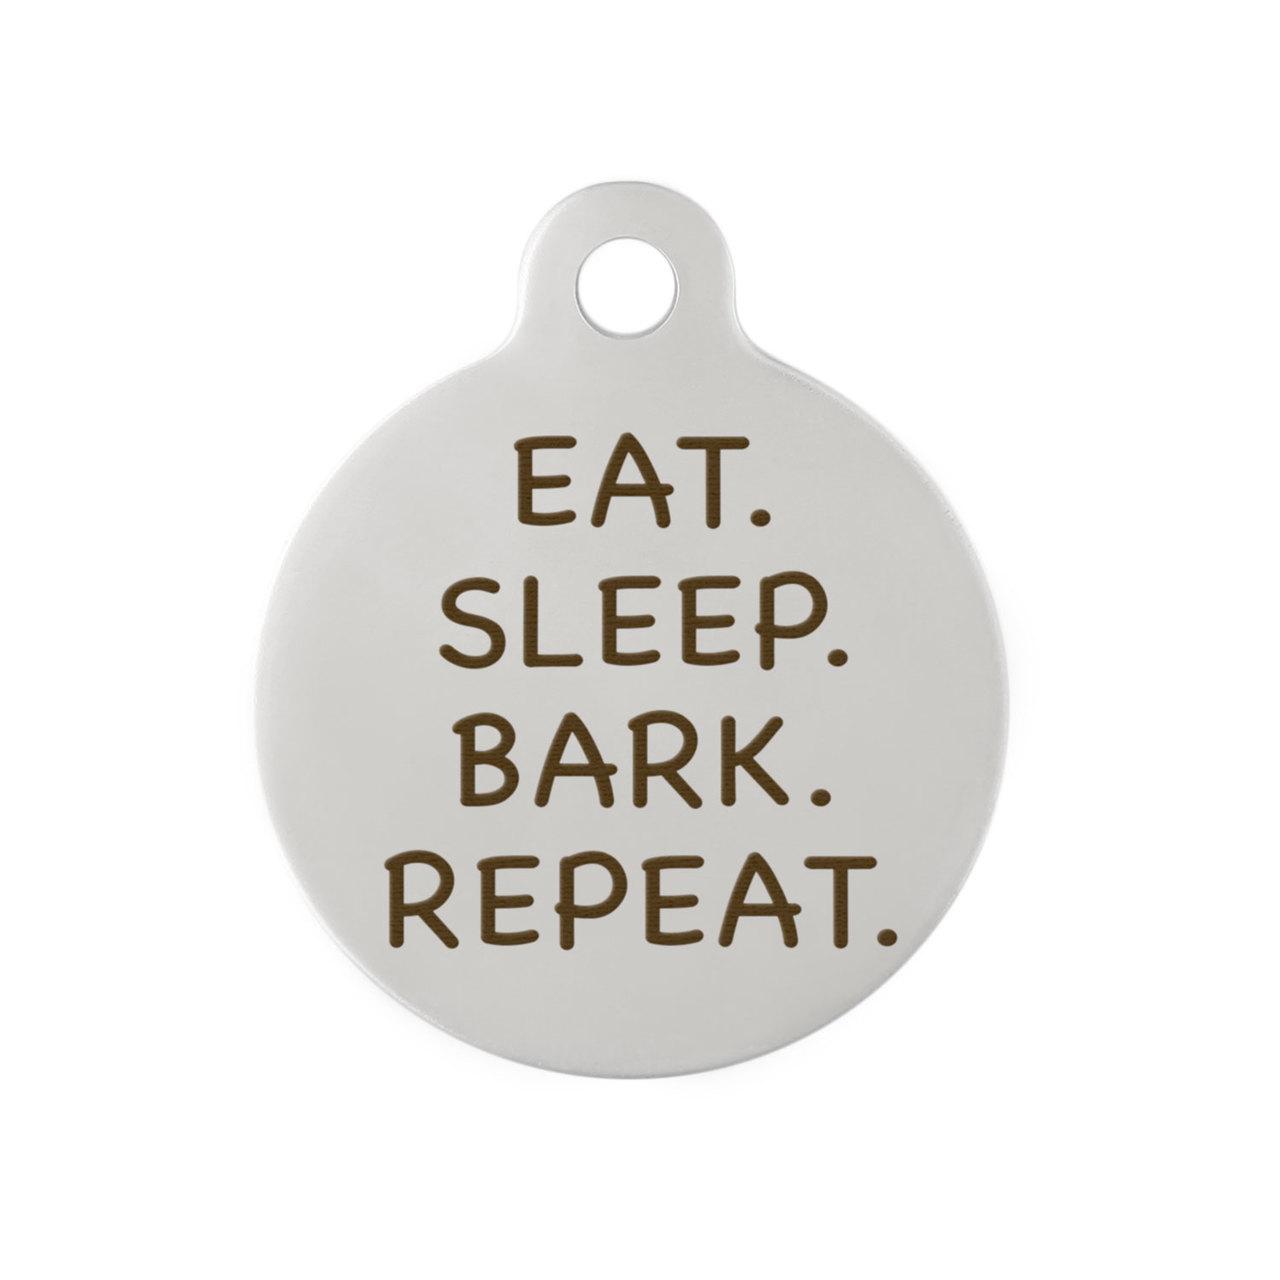 Signature Eat, Sleep, Bark Repeat Dog Tag  - Front Engraving